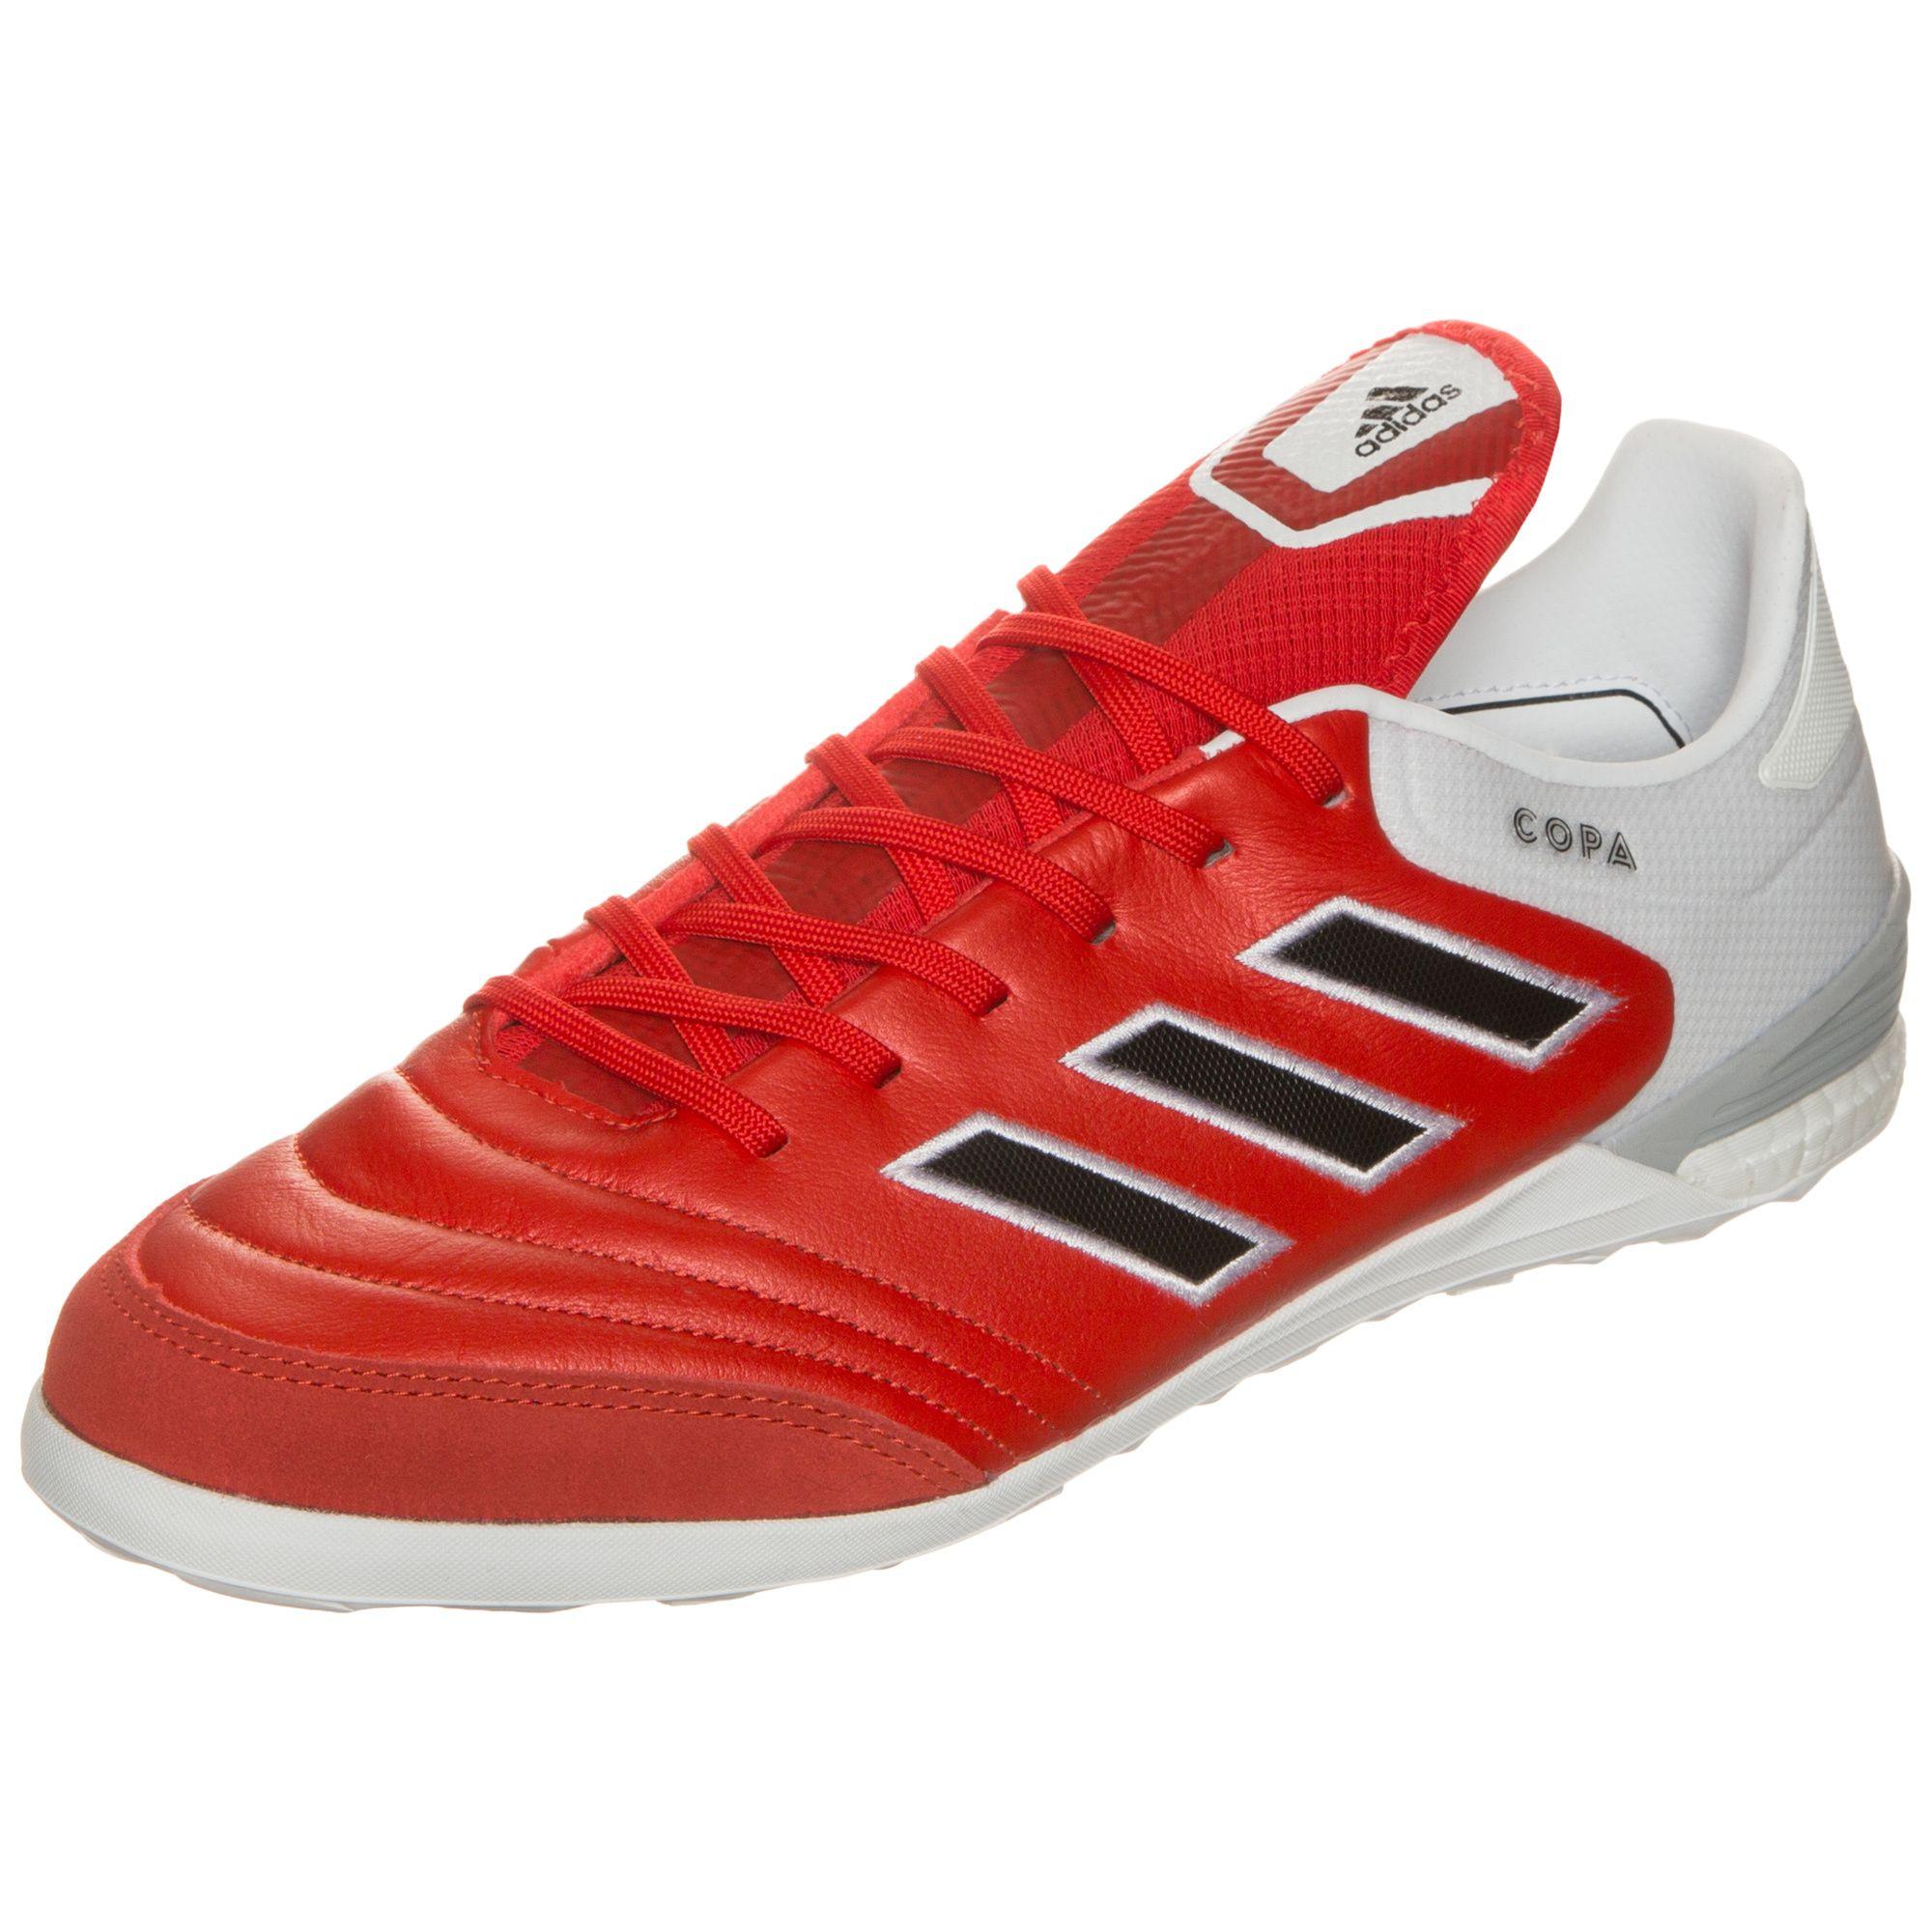 ADIDAS PERFORMANCE adidas Performance Copa Tango 17.1 Indoor Fußballschuh Herren